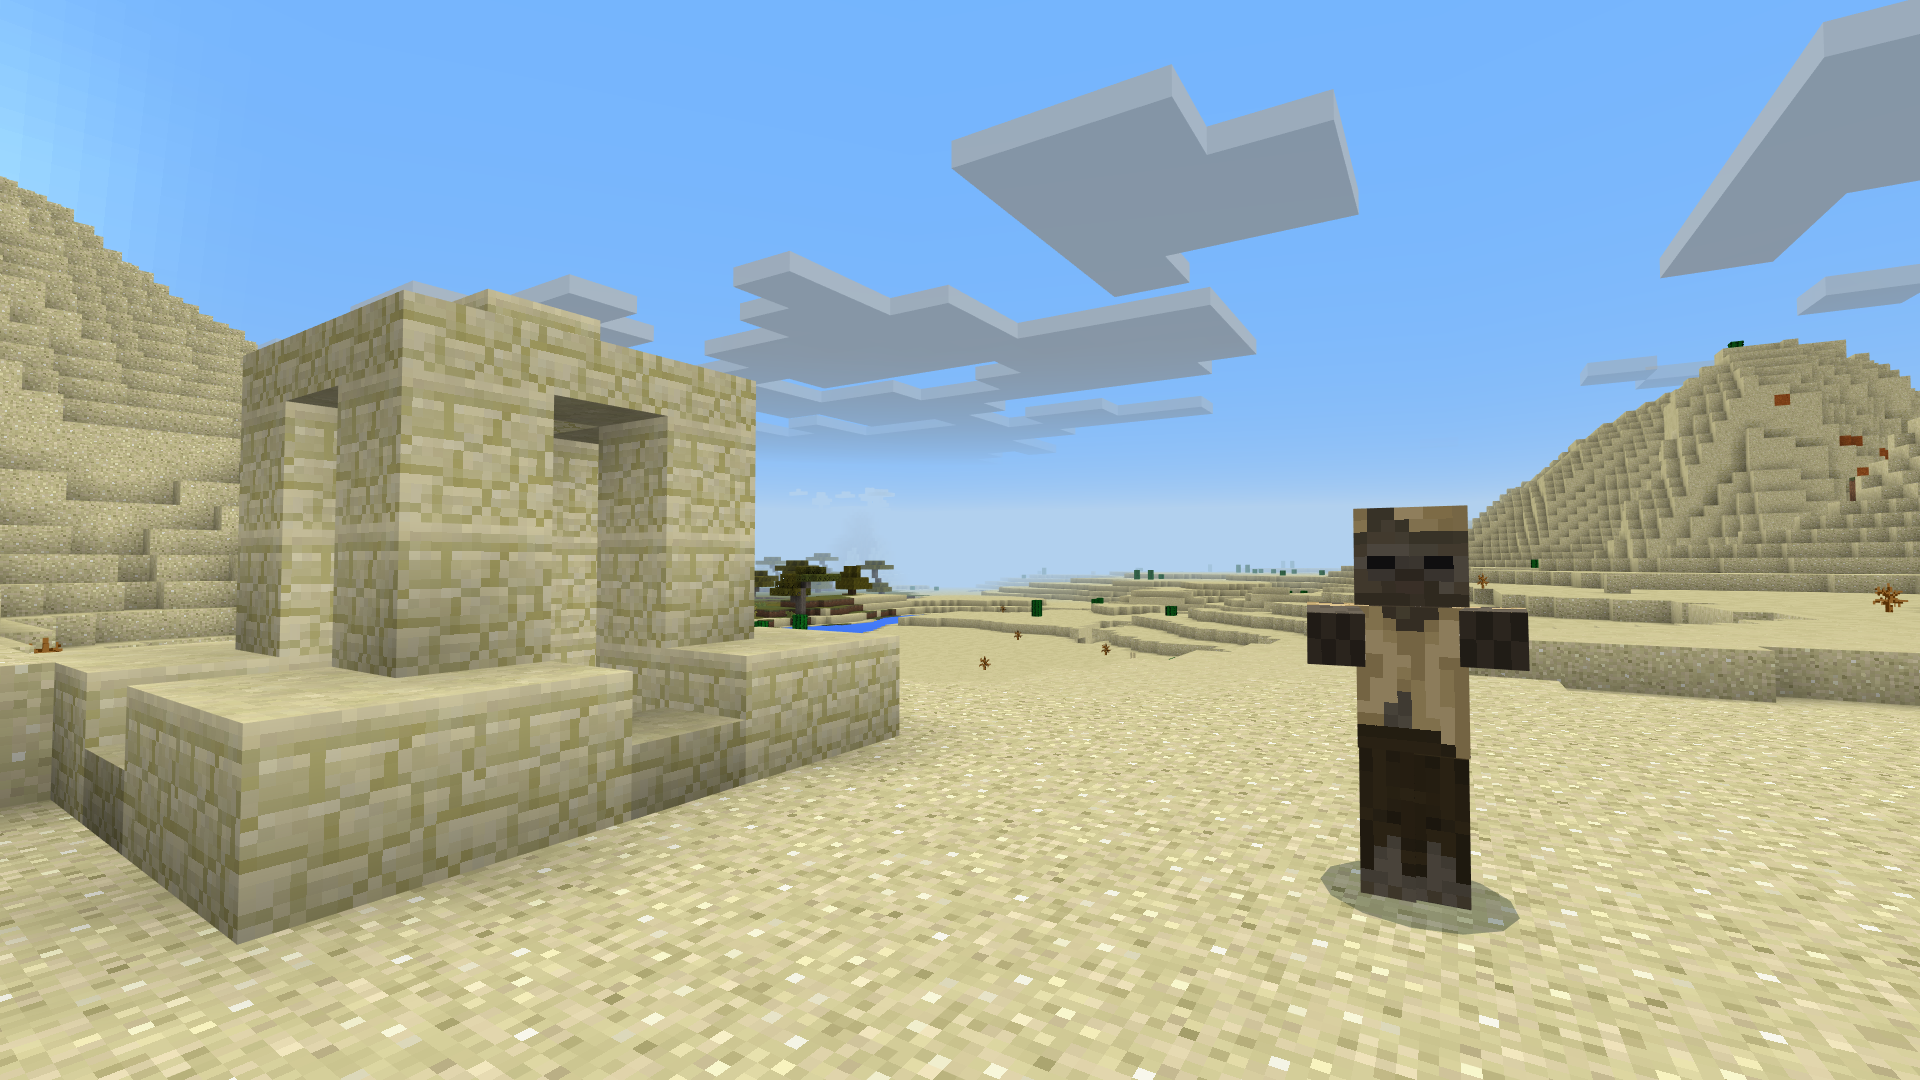 Minecraft: Apple TV Edition screenshot 5